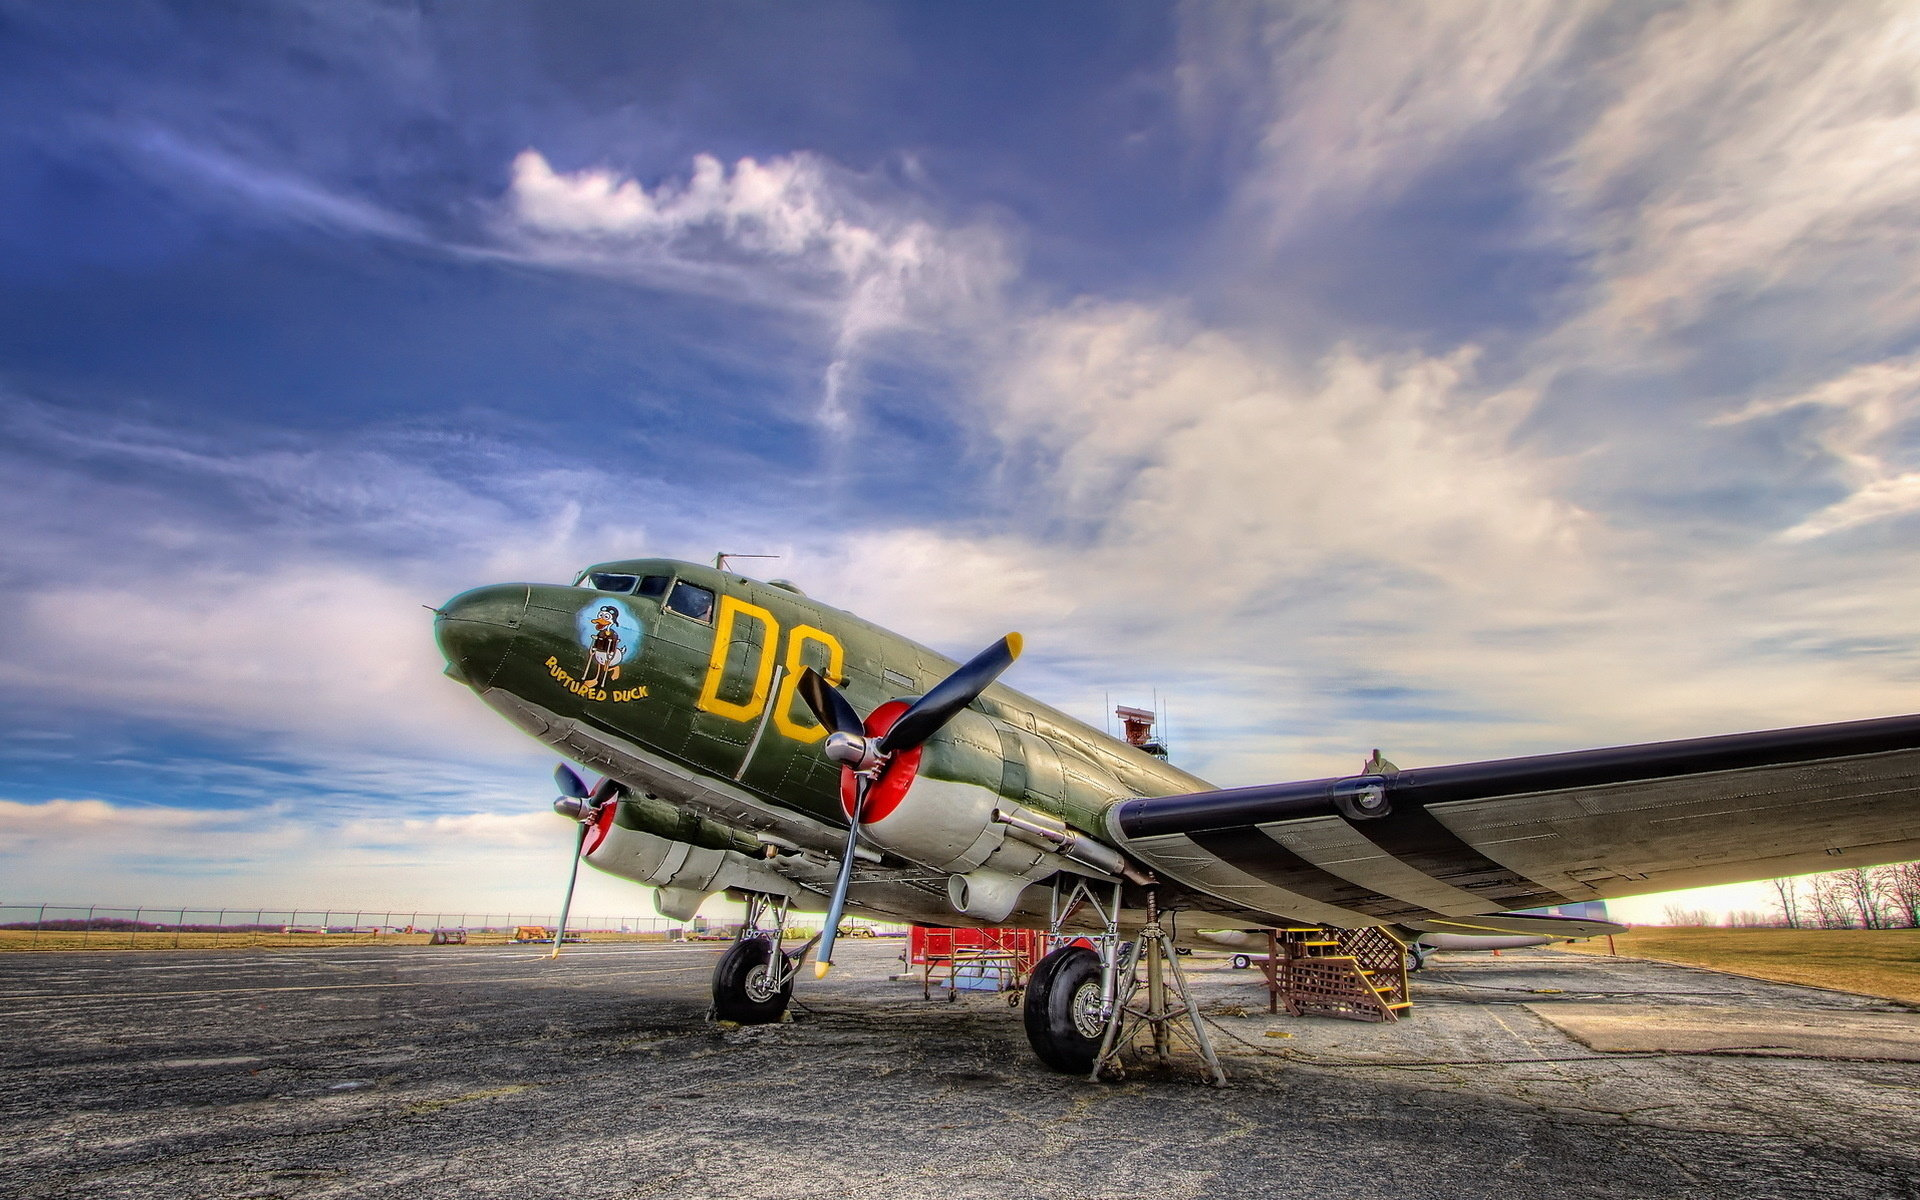 airplane & aircraft wallpapers 1920x1200 desktop backgrounds